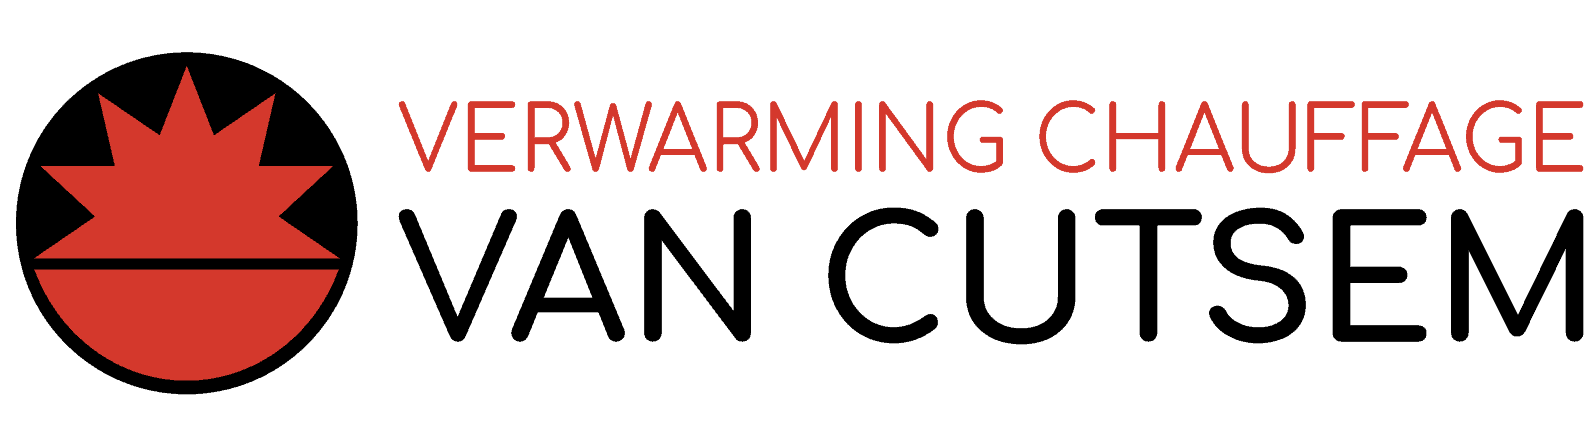 Chauffage Van Cutsem